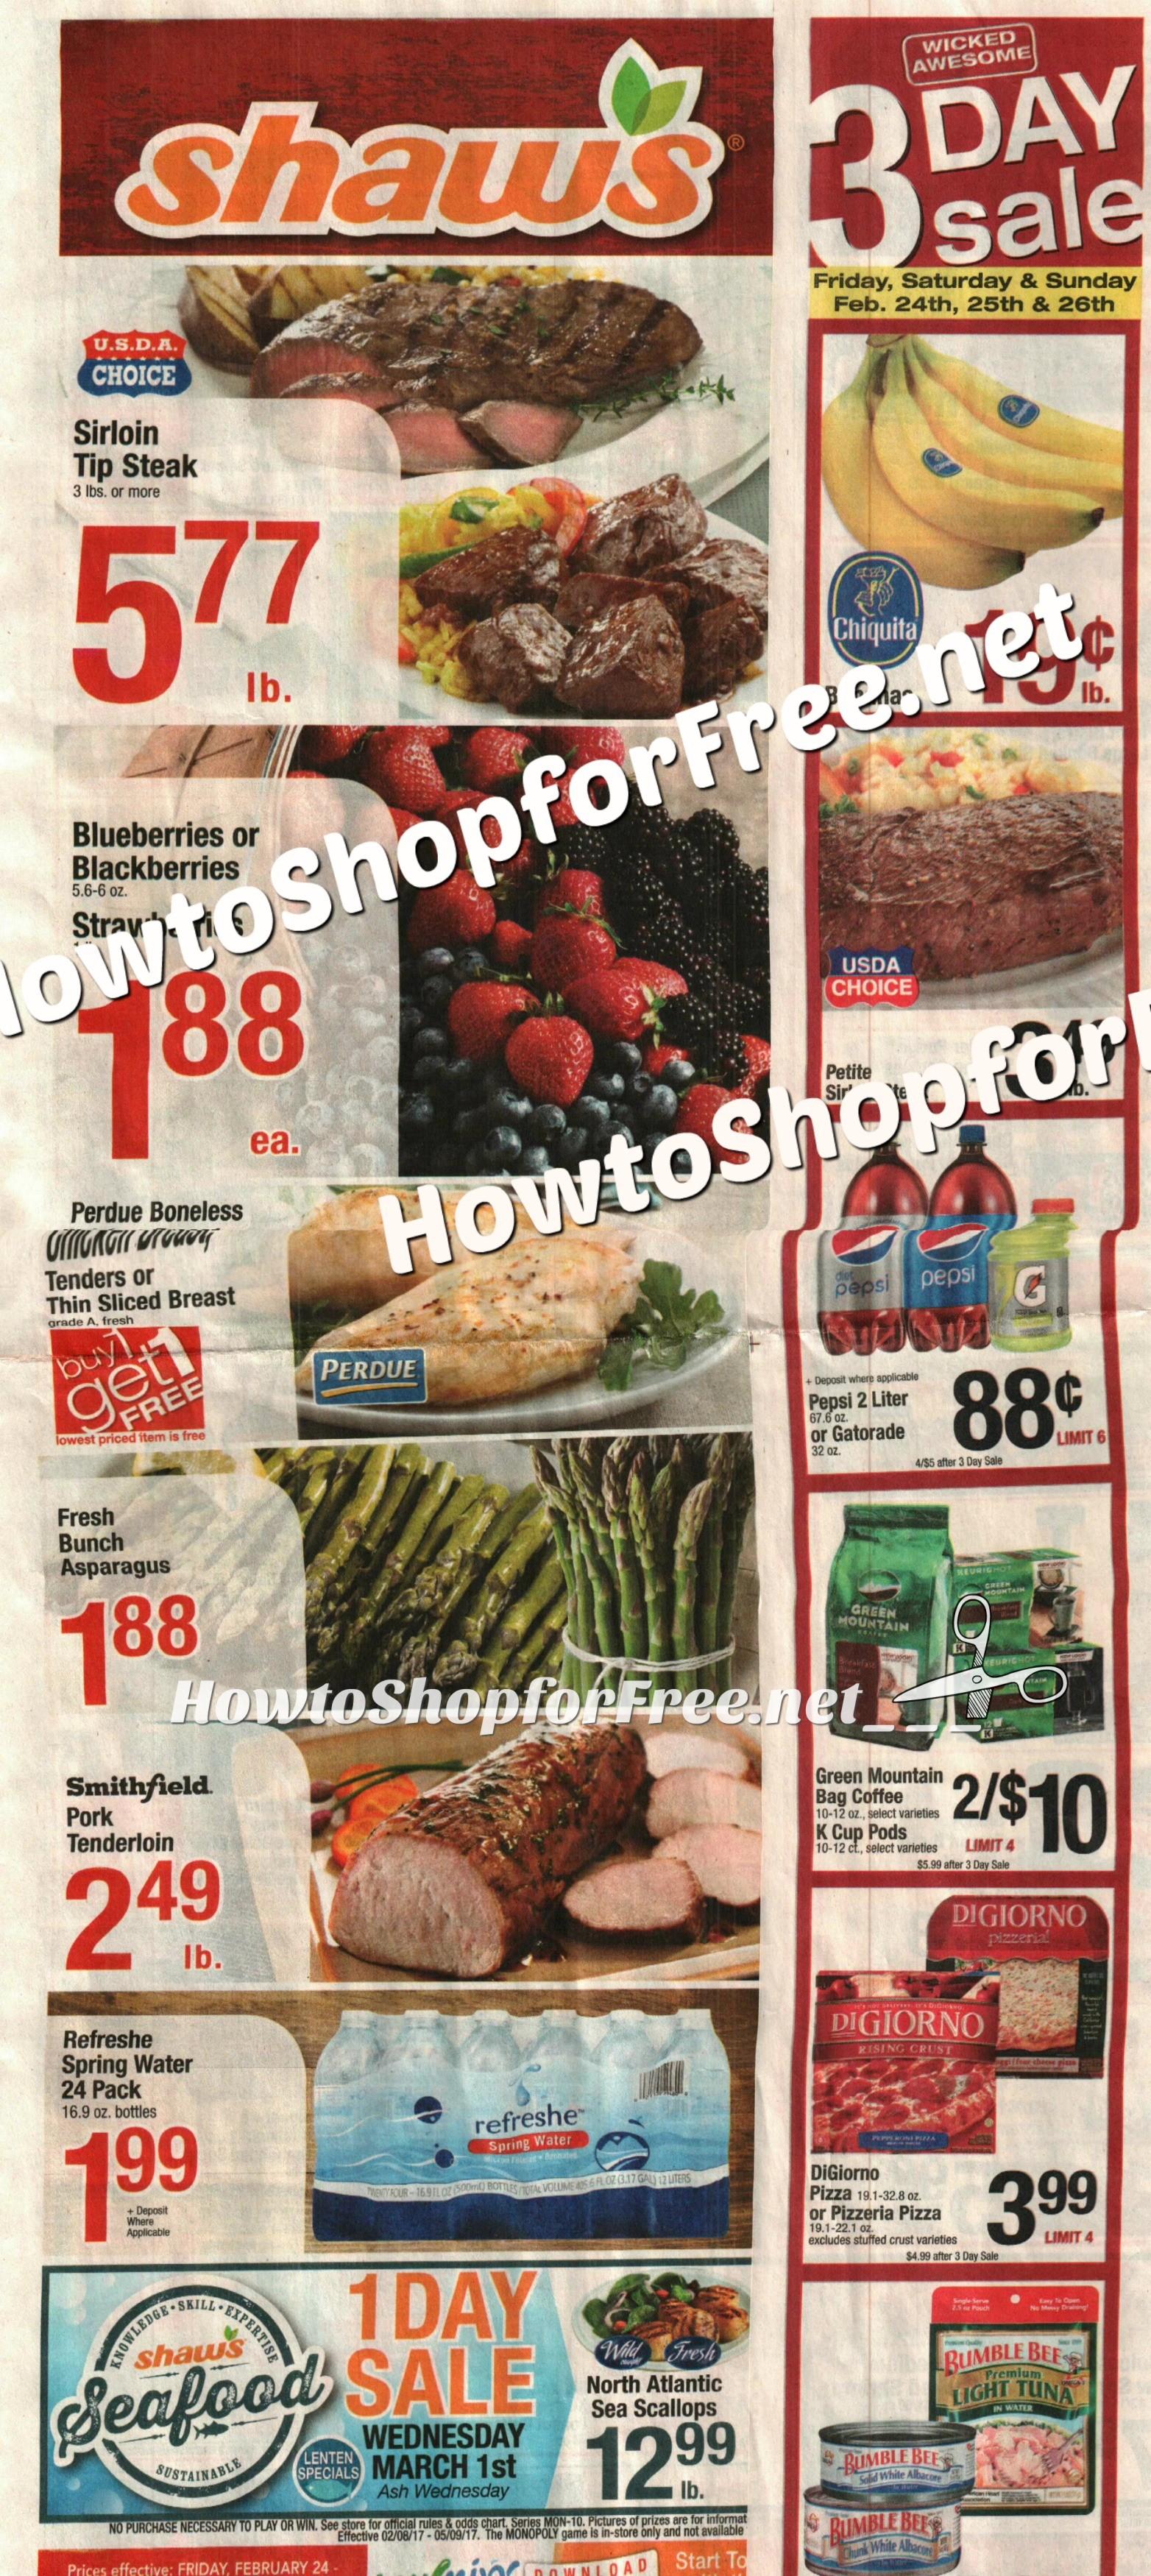 Shaws weekly sales flyer : Nisen sushi commack